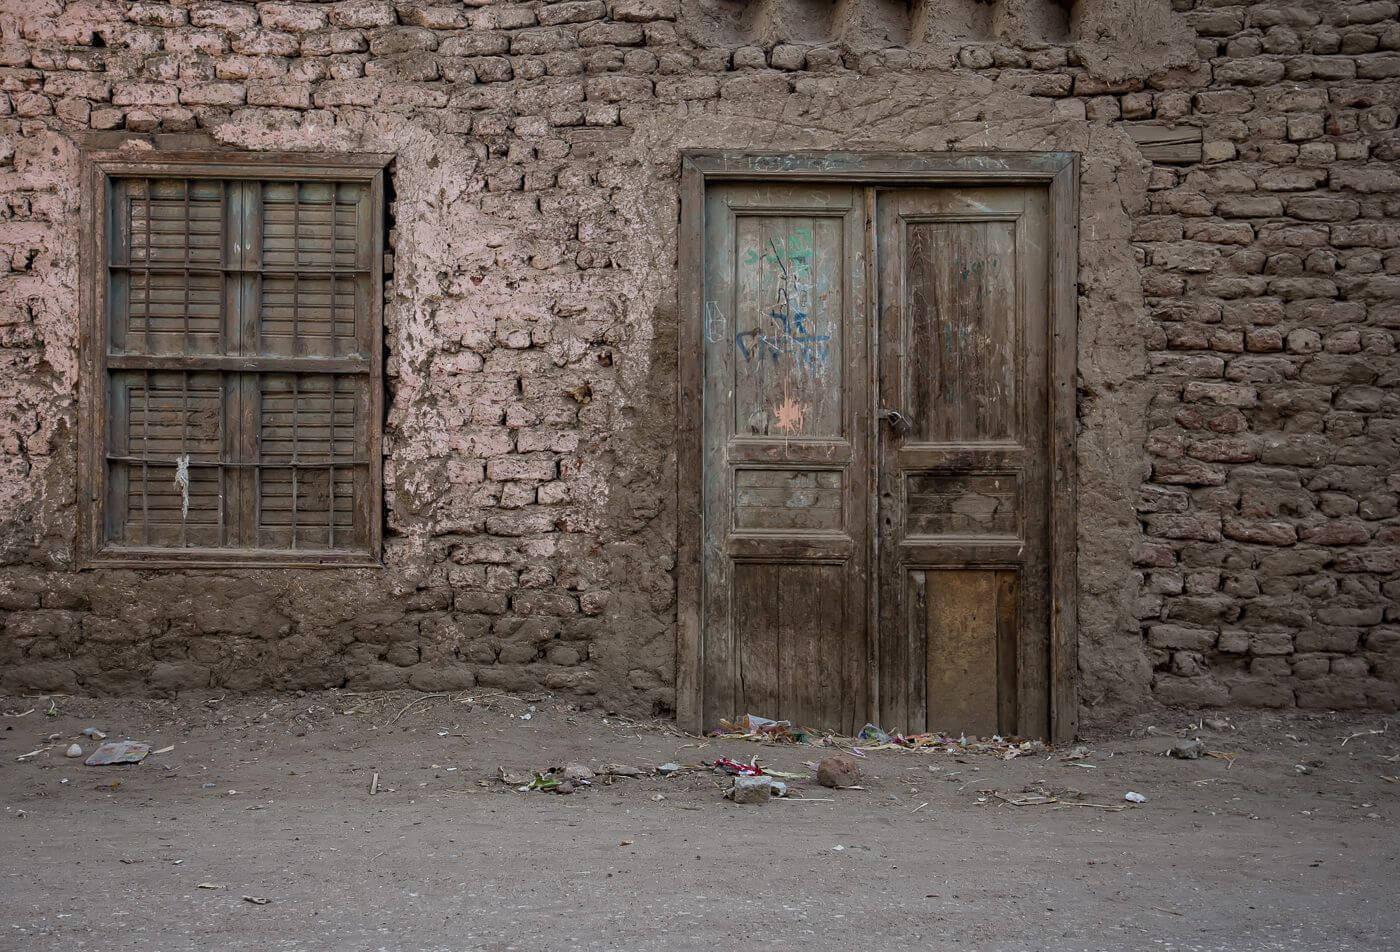 Luxor, Egypt - Photo by Zed Sindelar of CuriousZed Photography